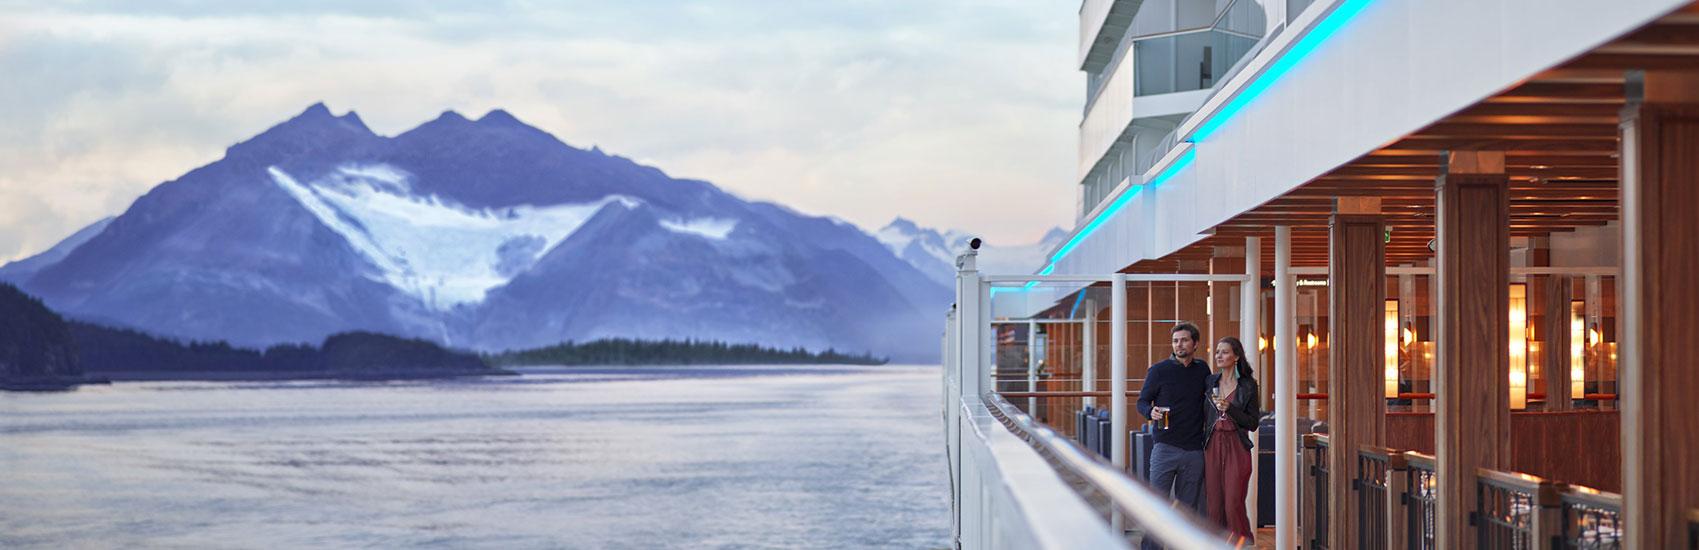 NCL is Sailing to Alaska Summer 2021 2